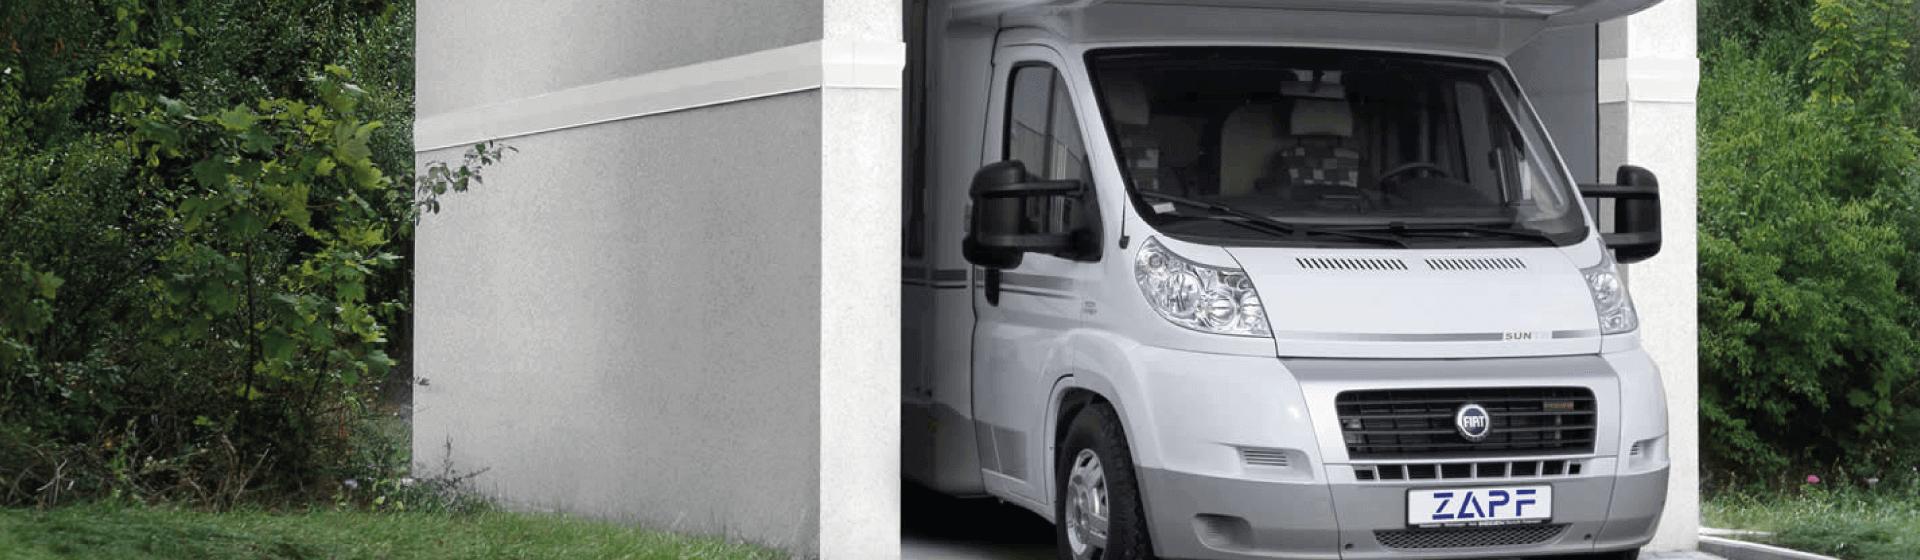 Garage camping car caravanes